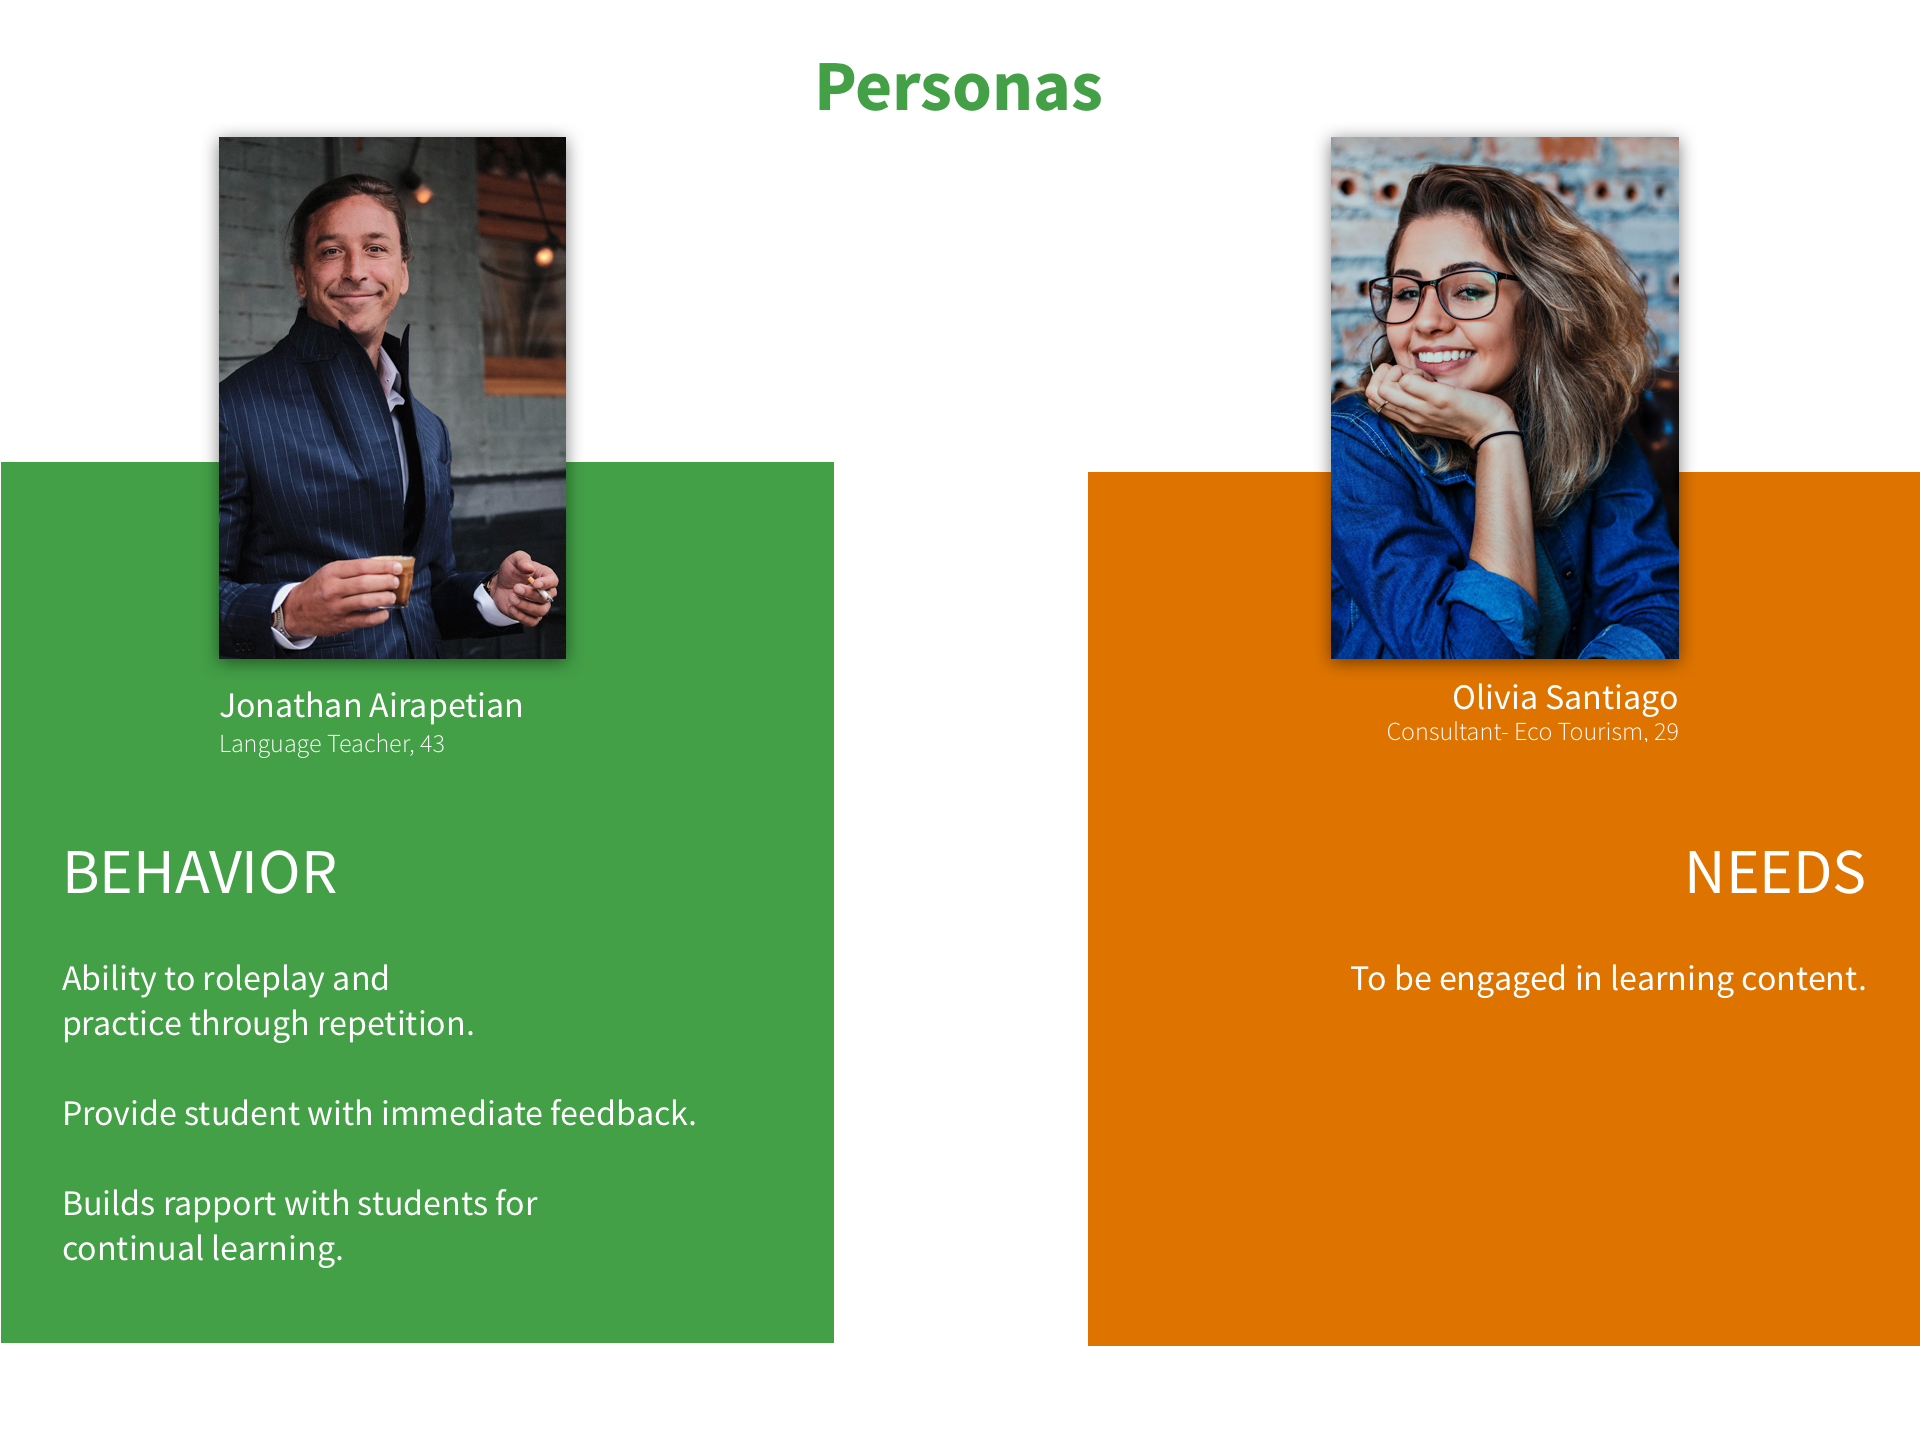 Personas- needs 4.png